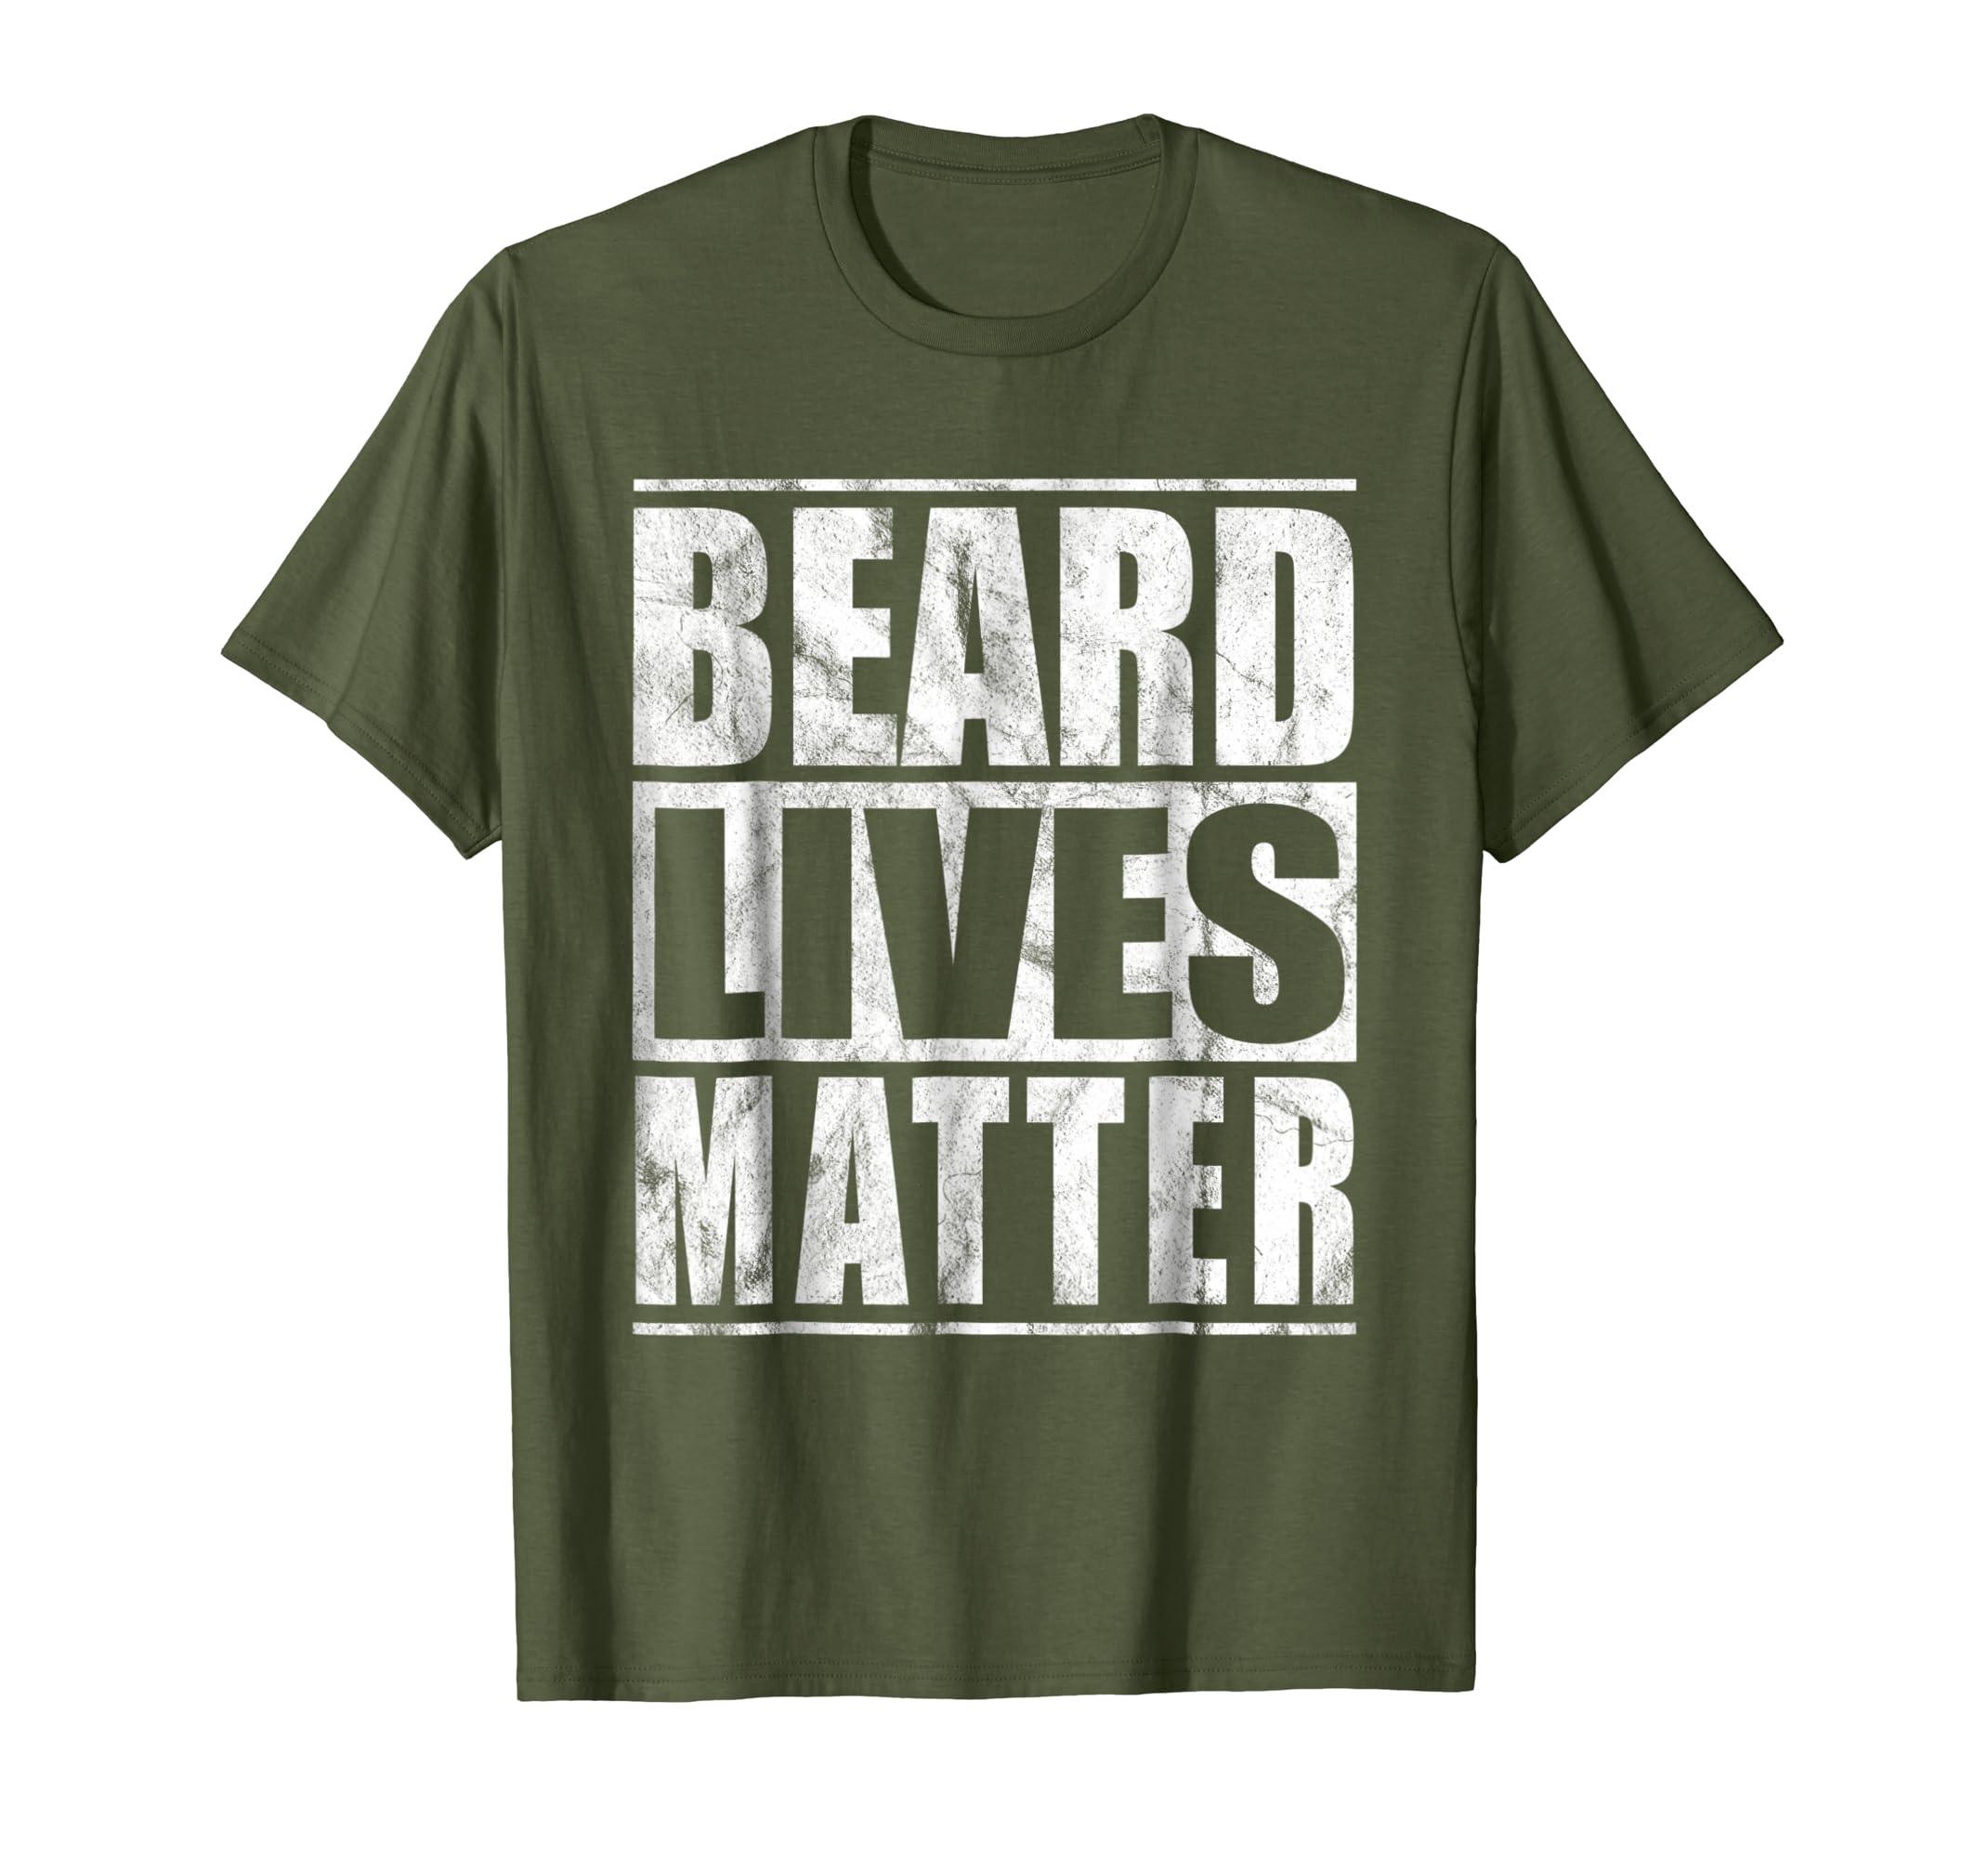 0a43289e Amazon.com: Beard Lives Matter T-Shirt Vintage Bearded Men Shirt Gift:  Clothing